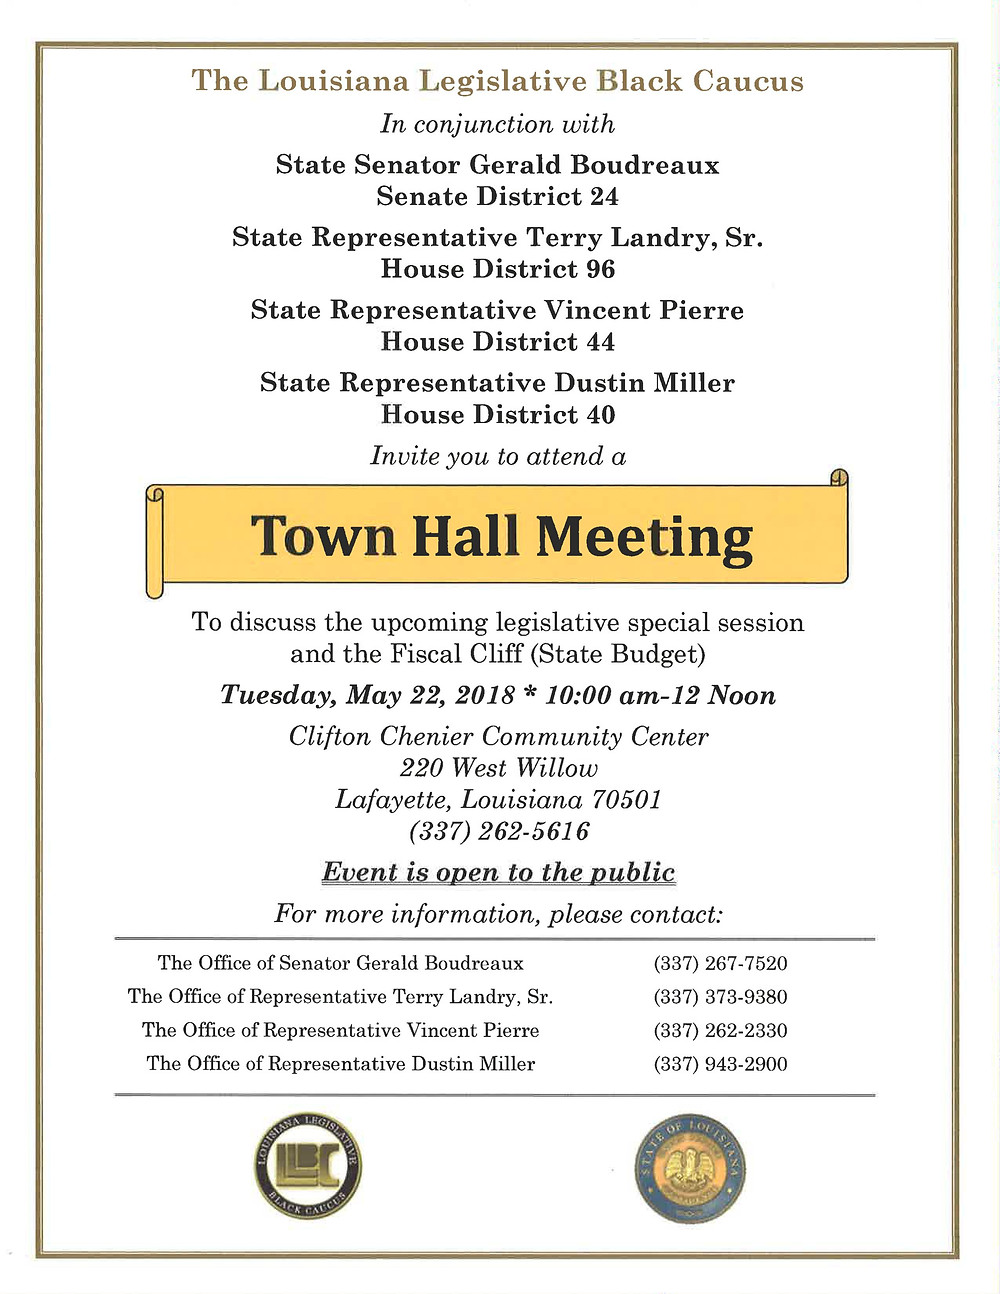 The Louisiana Legislative Black Caucus Schedules a Town Hall Meeting